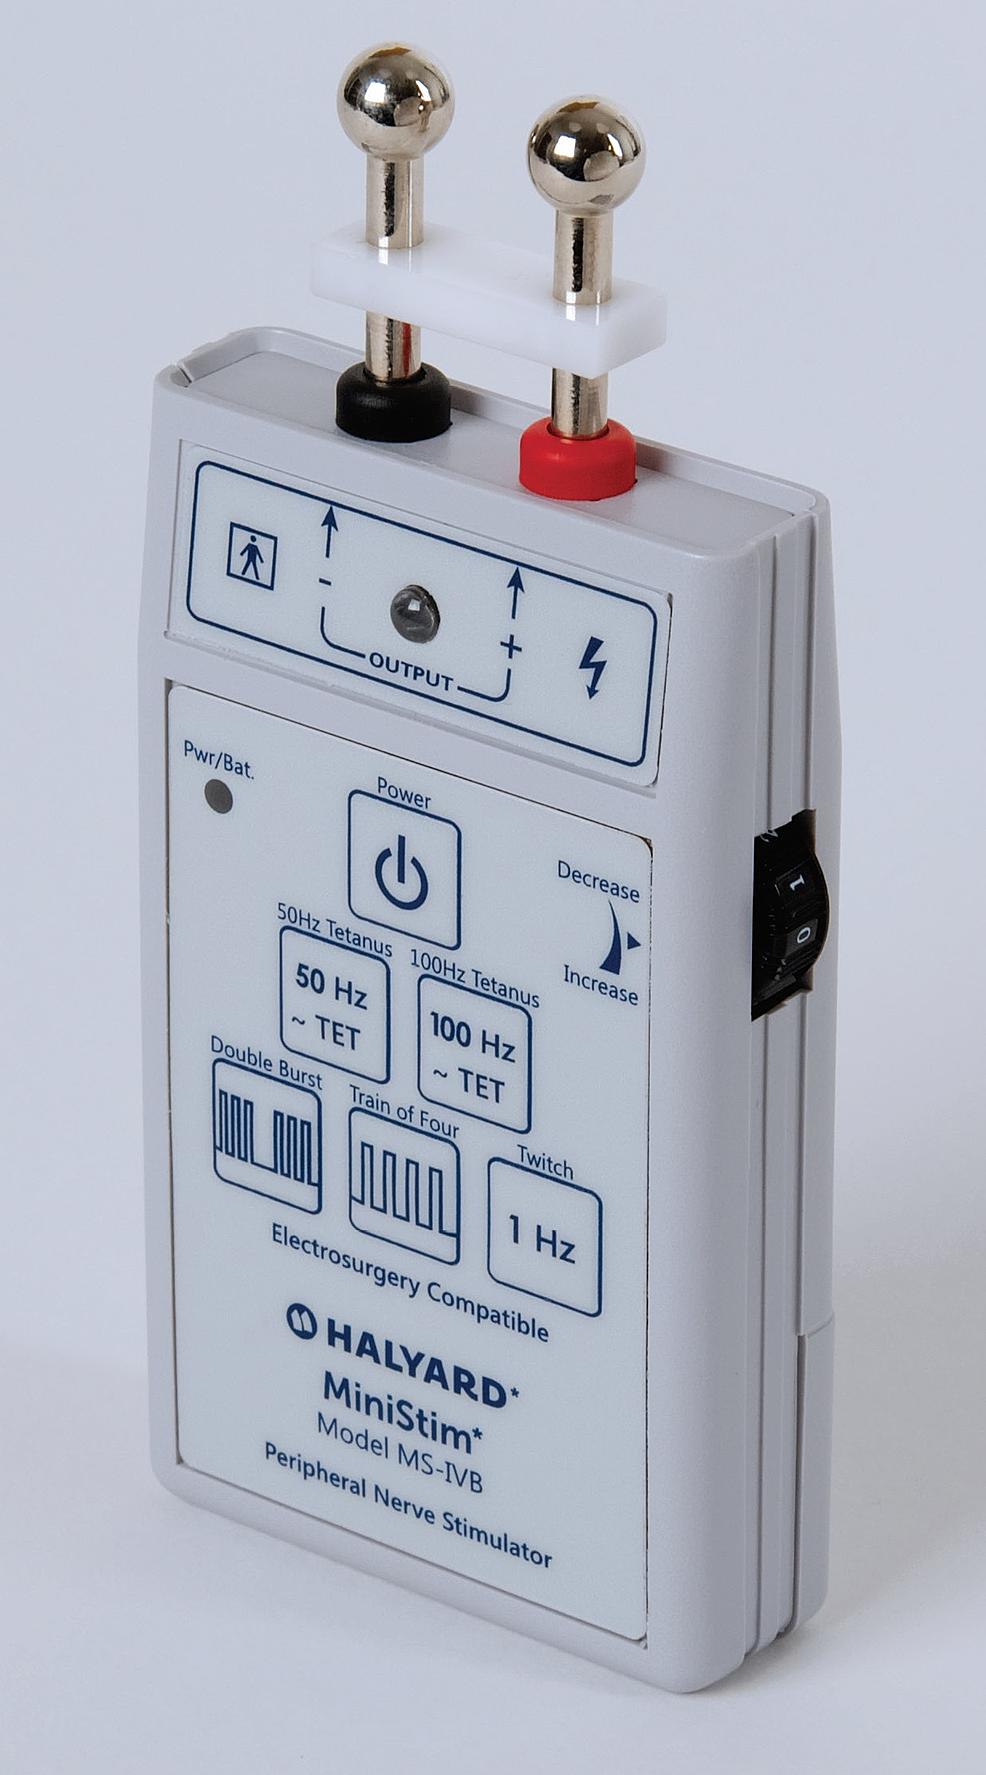 Halyard-Ministim®-MS-IVB-model